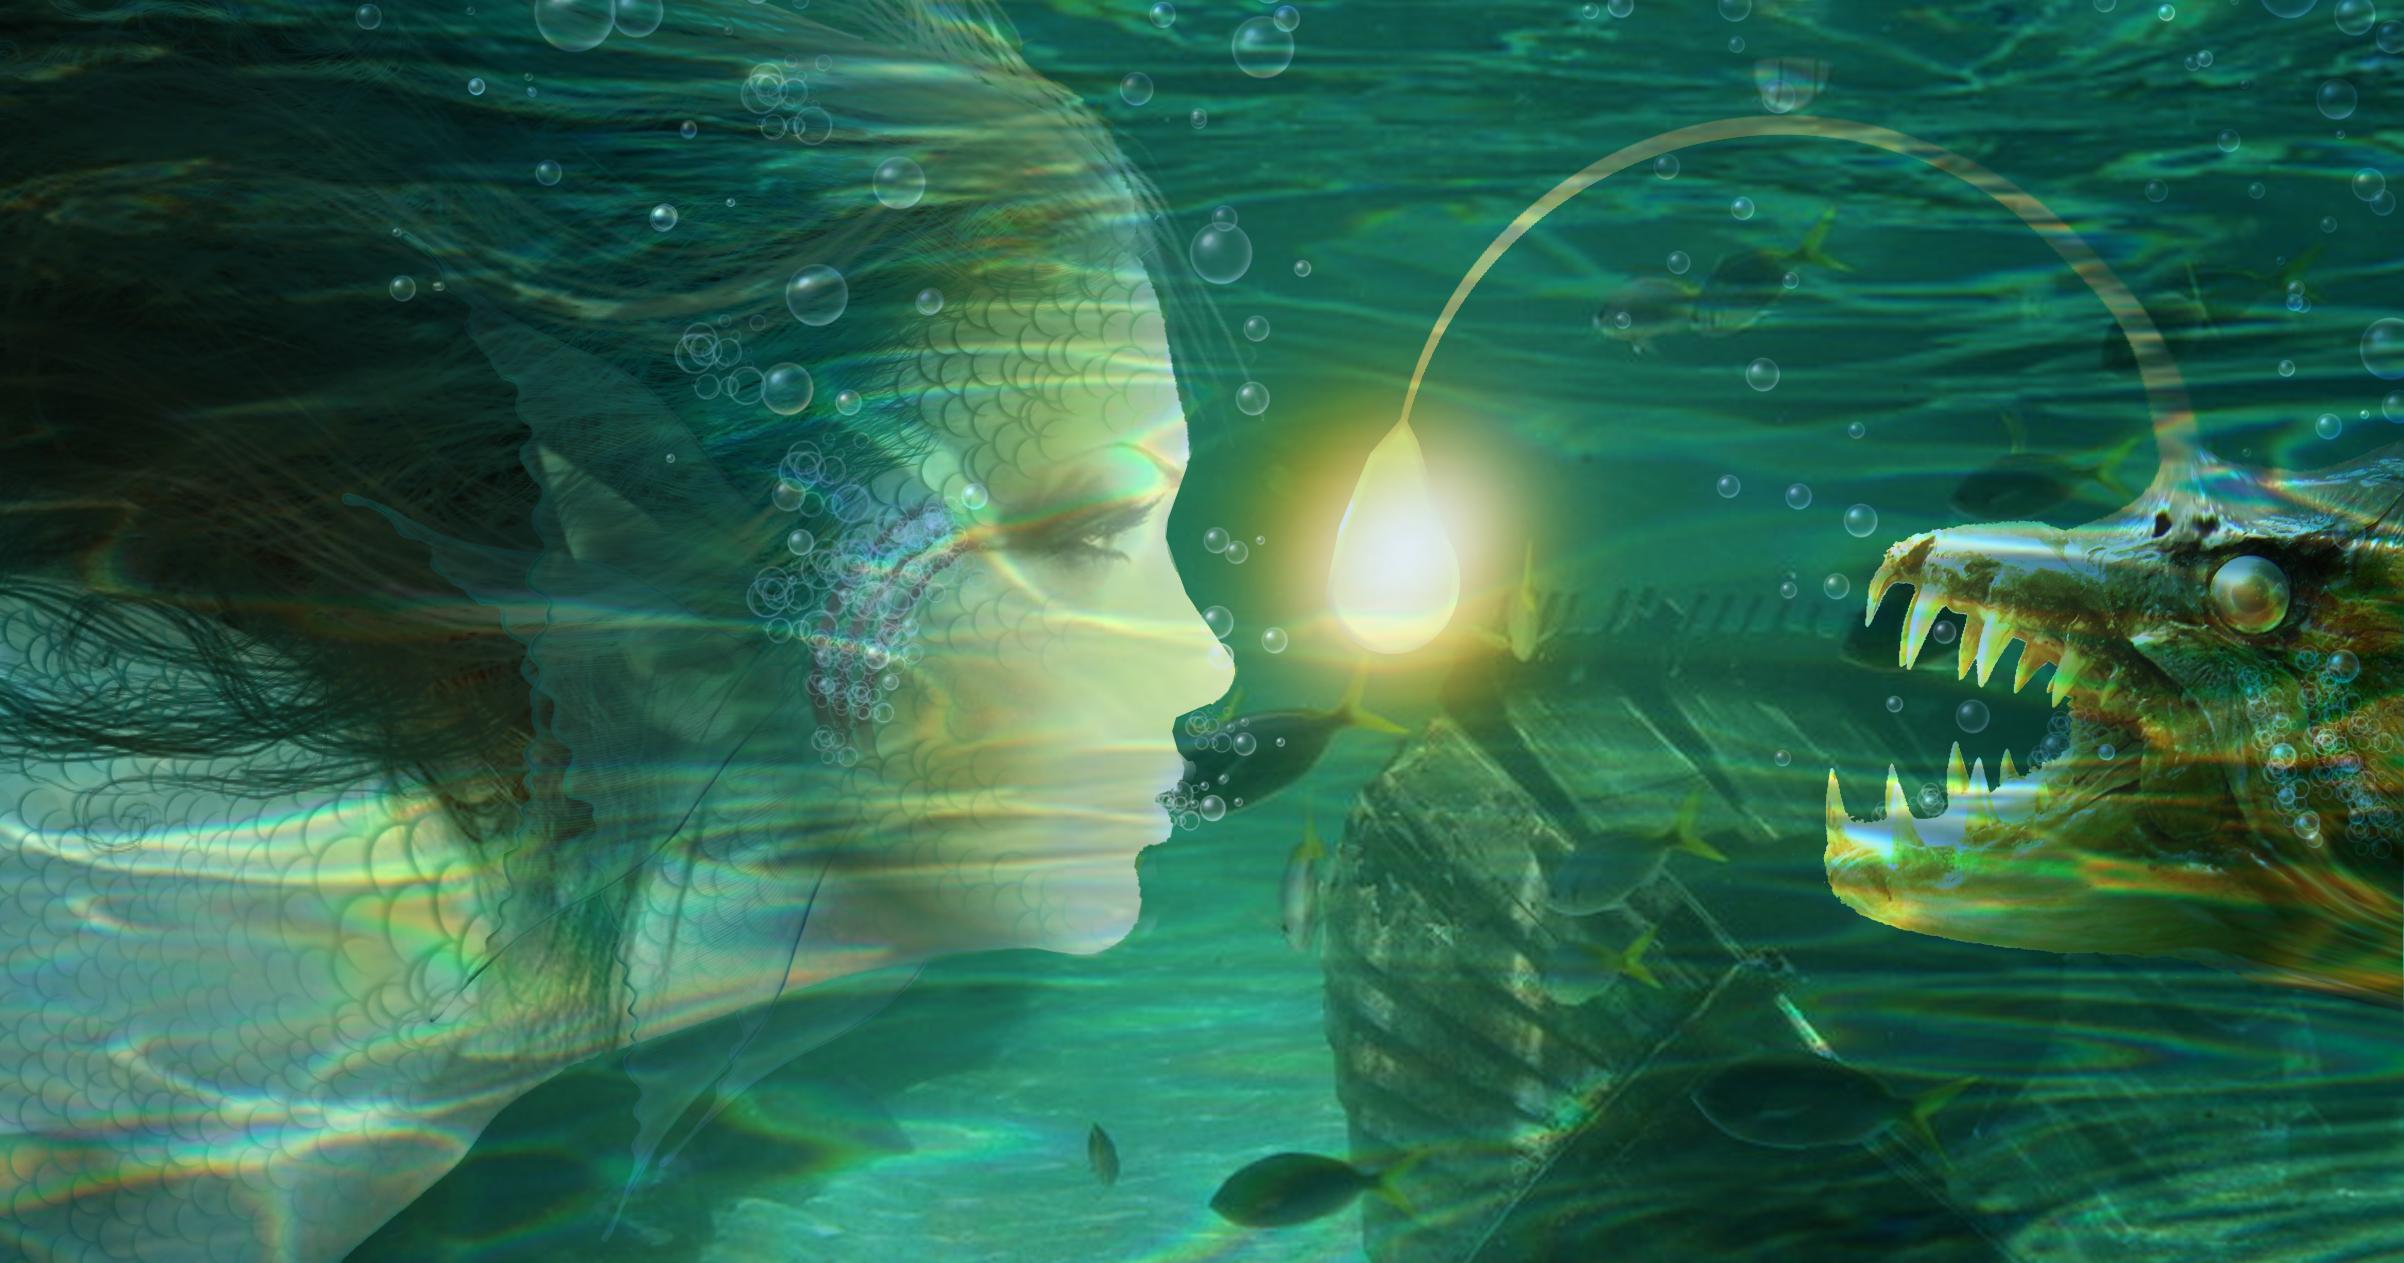 Undersea Encounter by SybilThorn